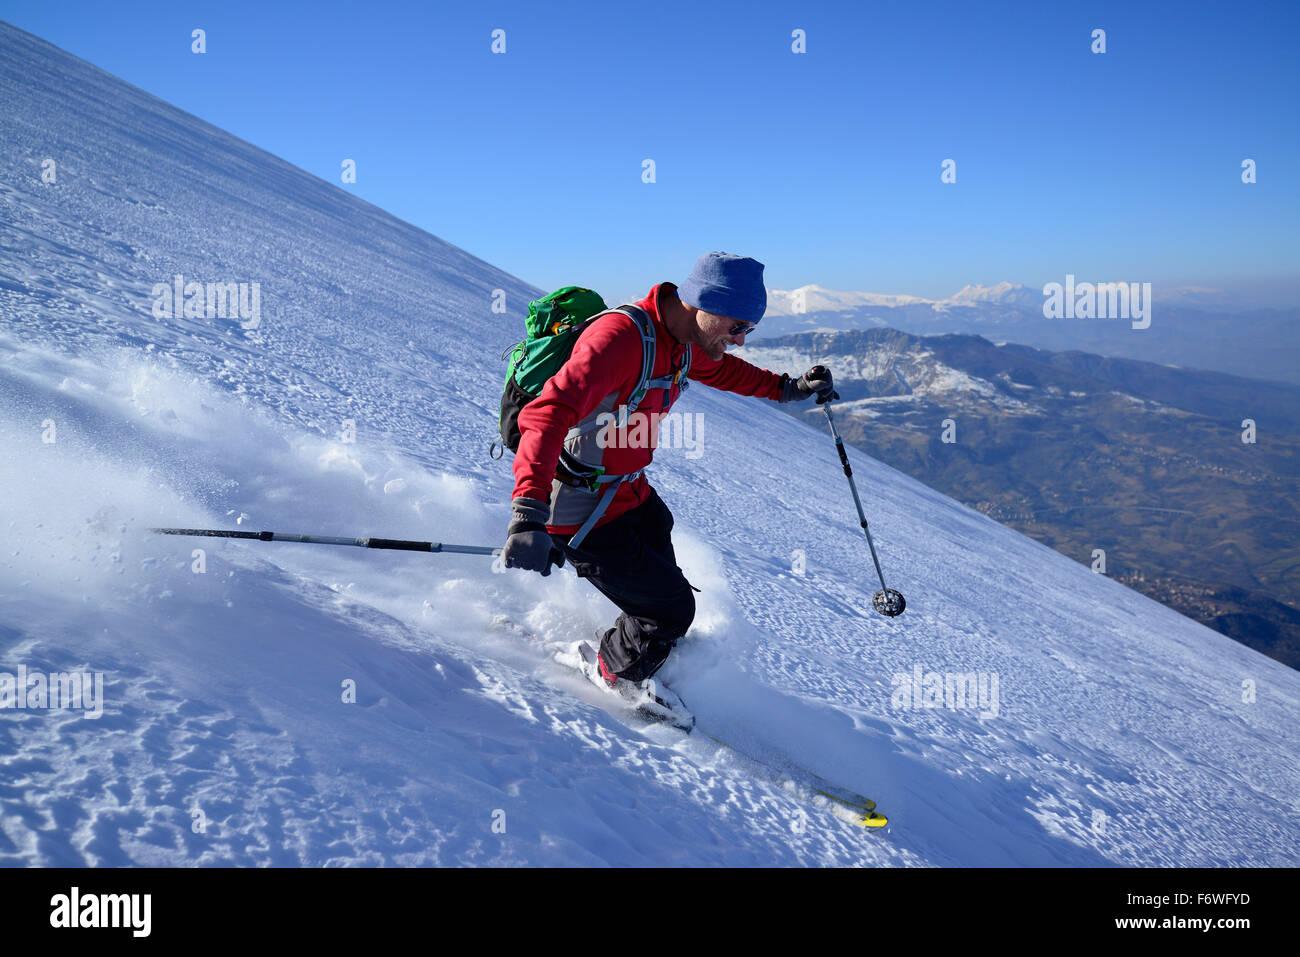 Backcountry skier downhill skiing, Monte Prena, Gran Sasso, Abruzzo, Italy - Stock Image